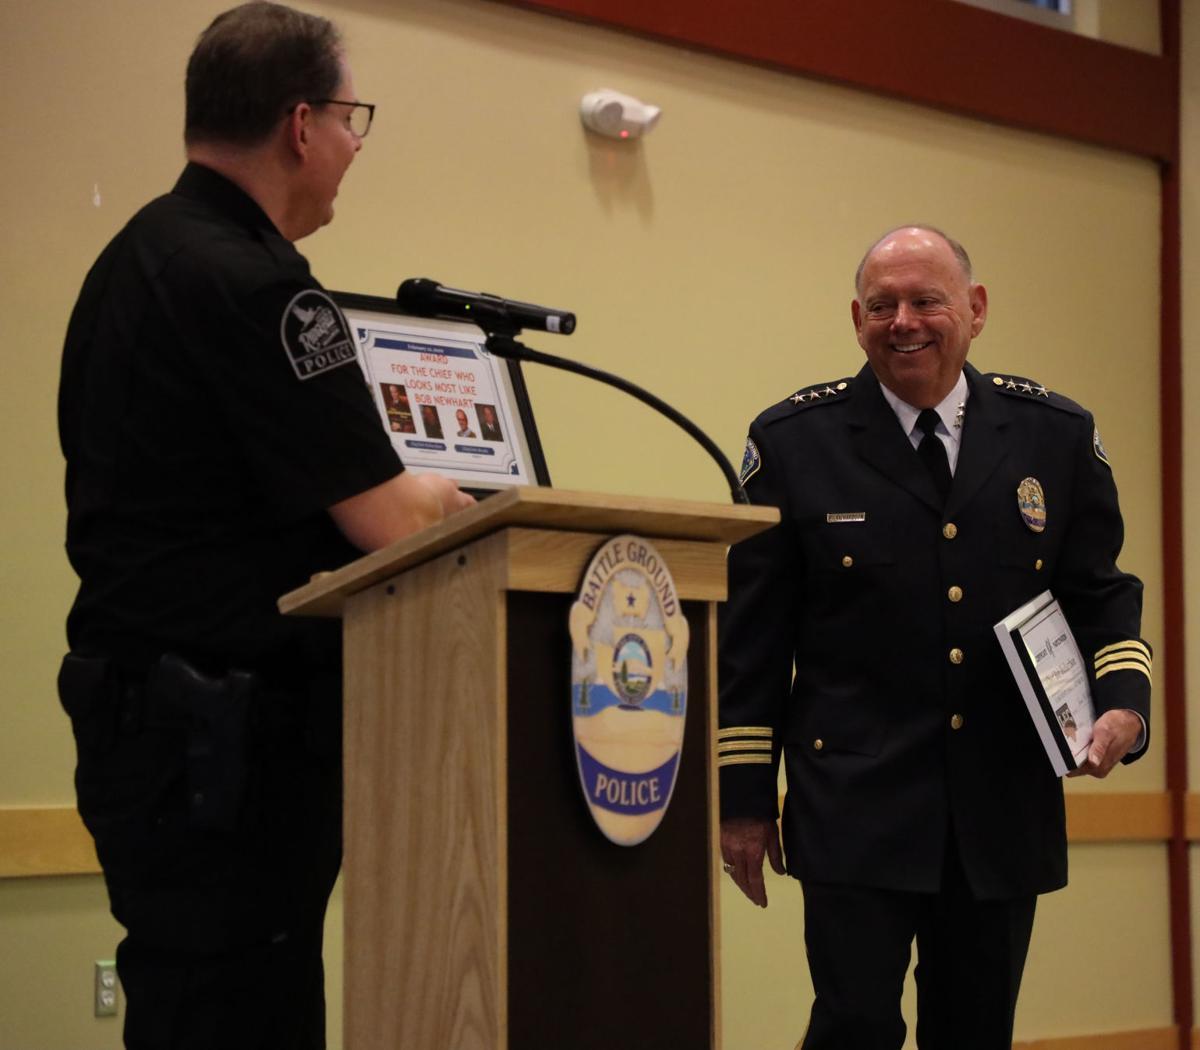 Chief Richardson retires